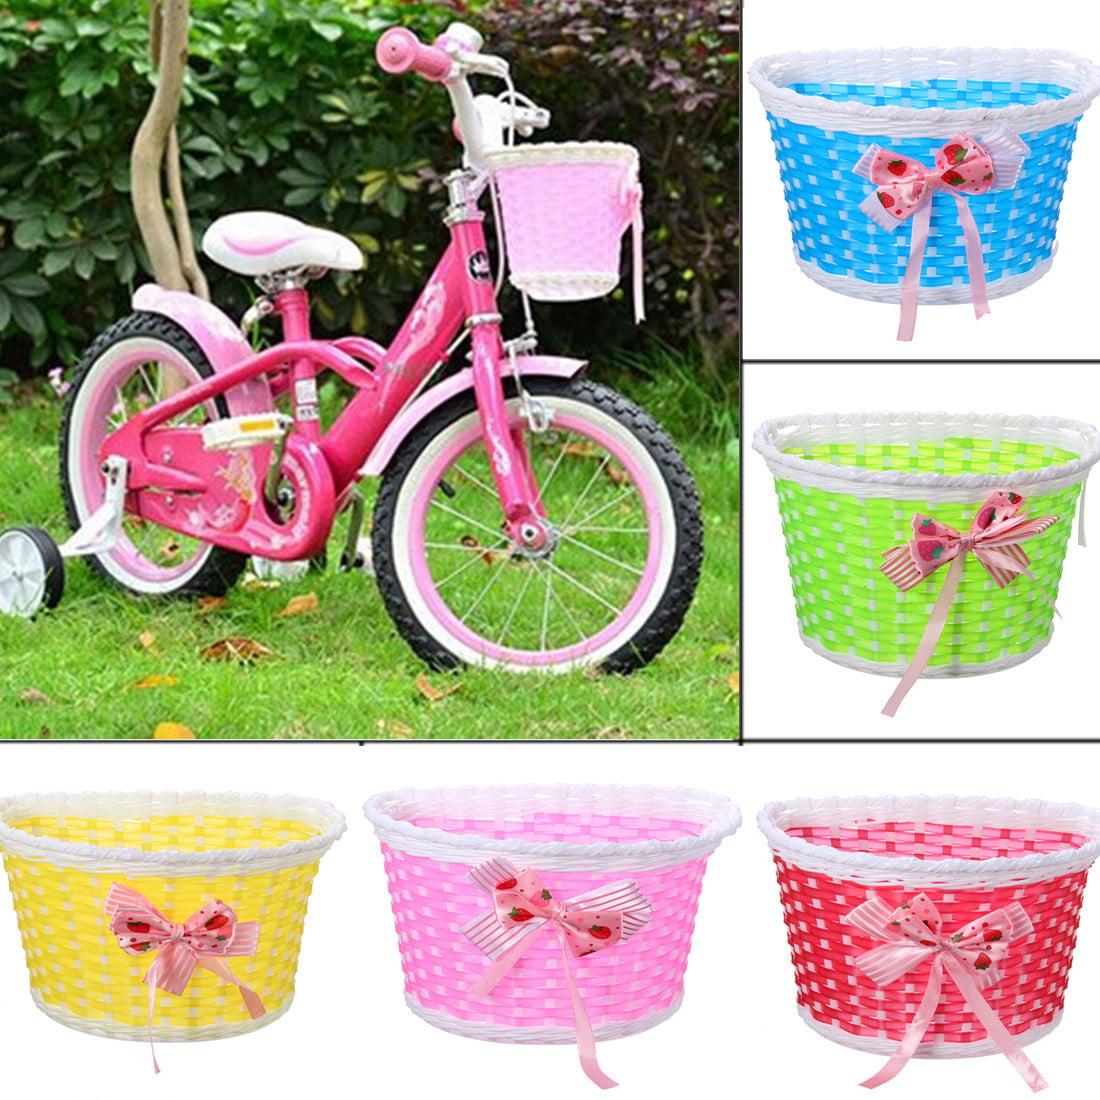 Bike Cycle Bicycle Front Basket Flowery Shopping Holder Case Children Kids Girls